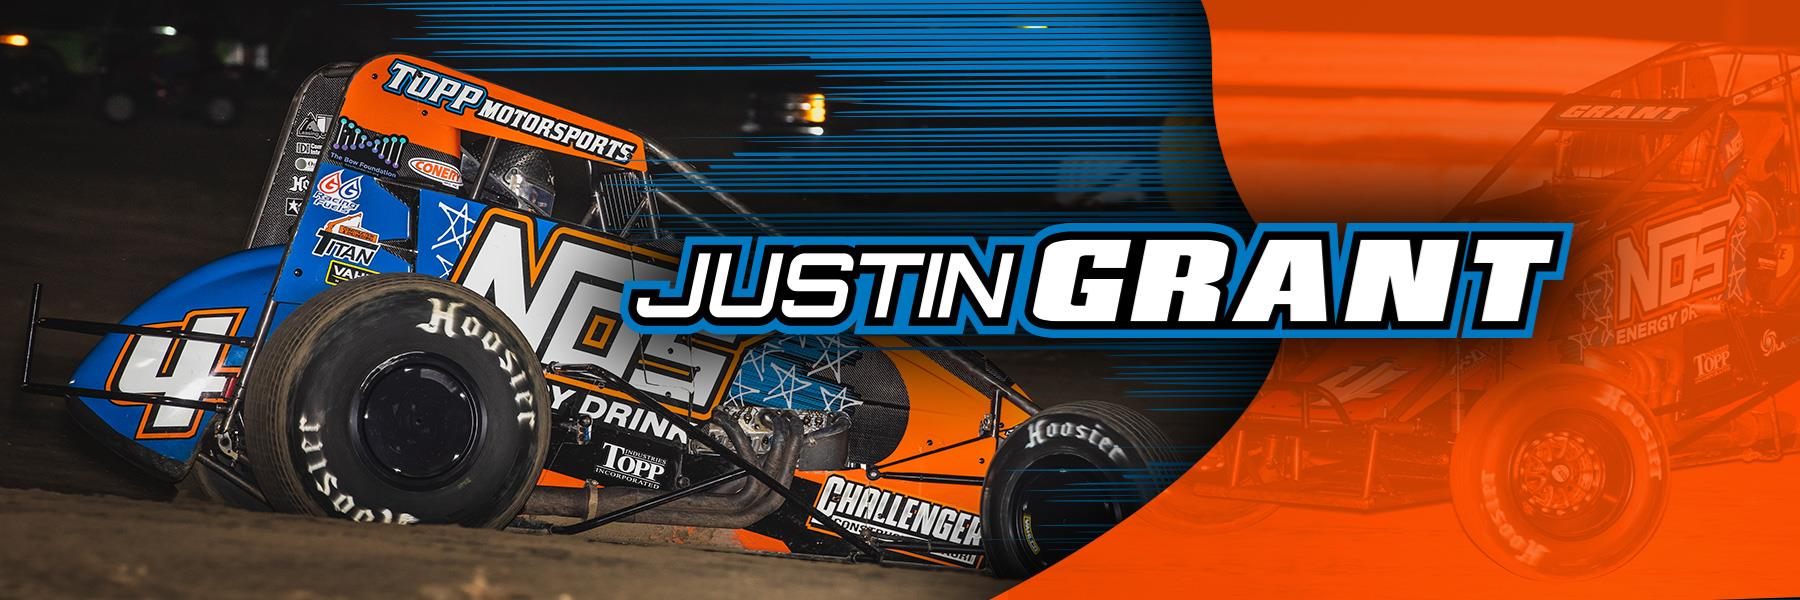 Justin Grant